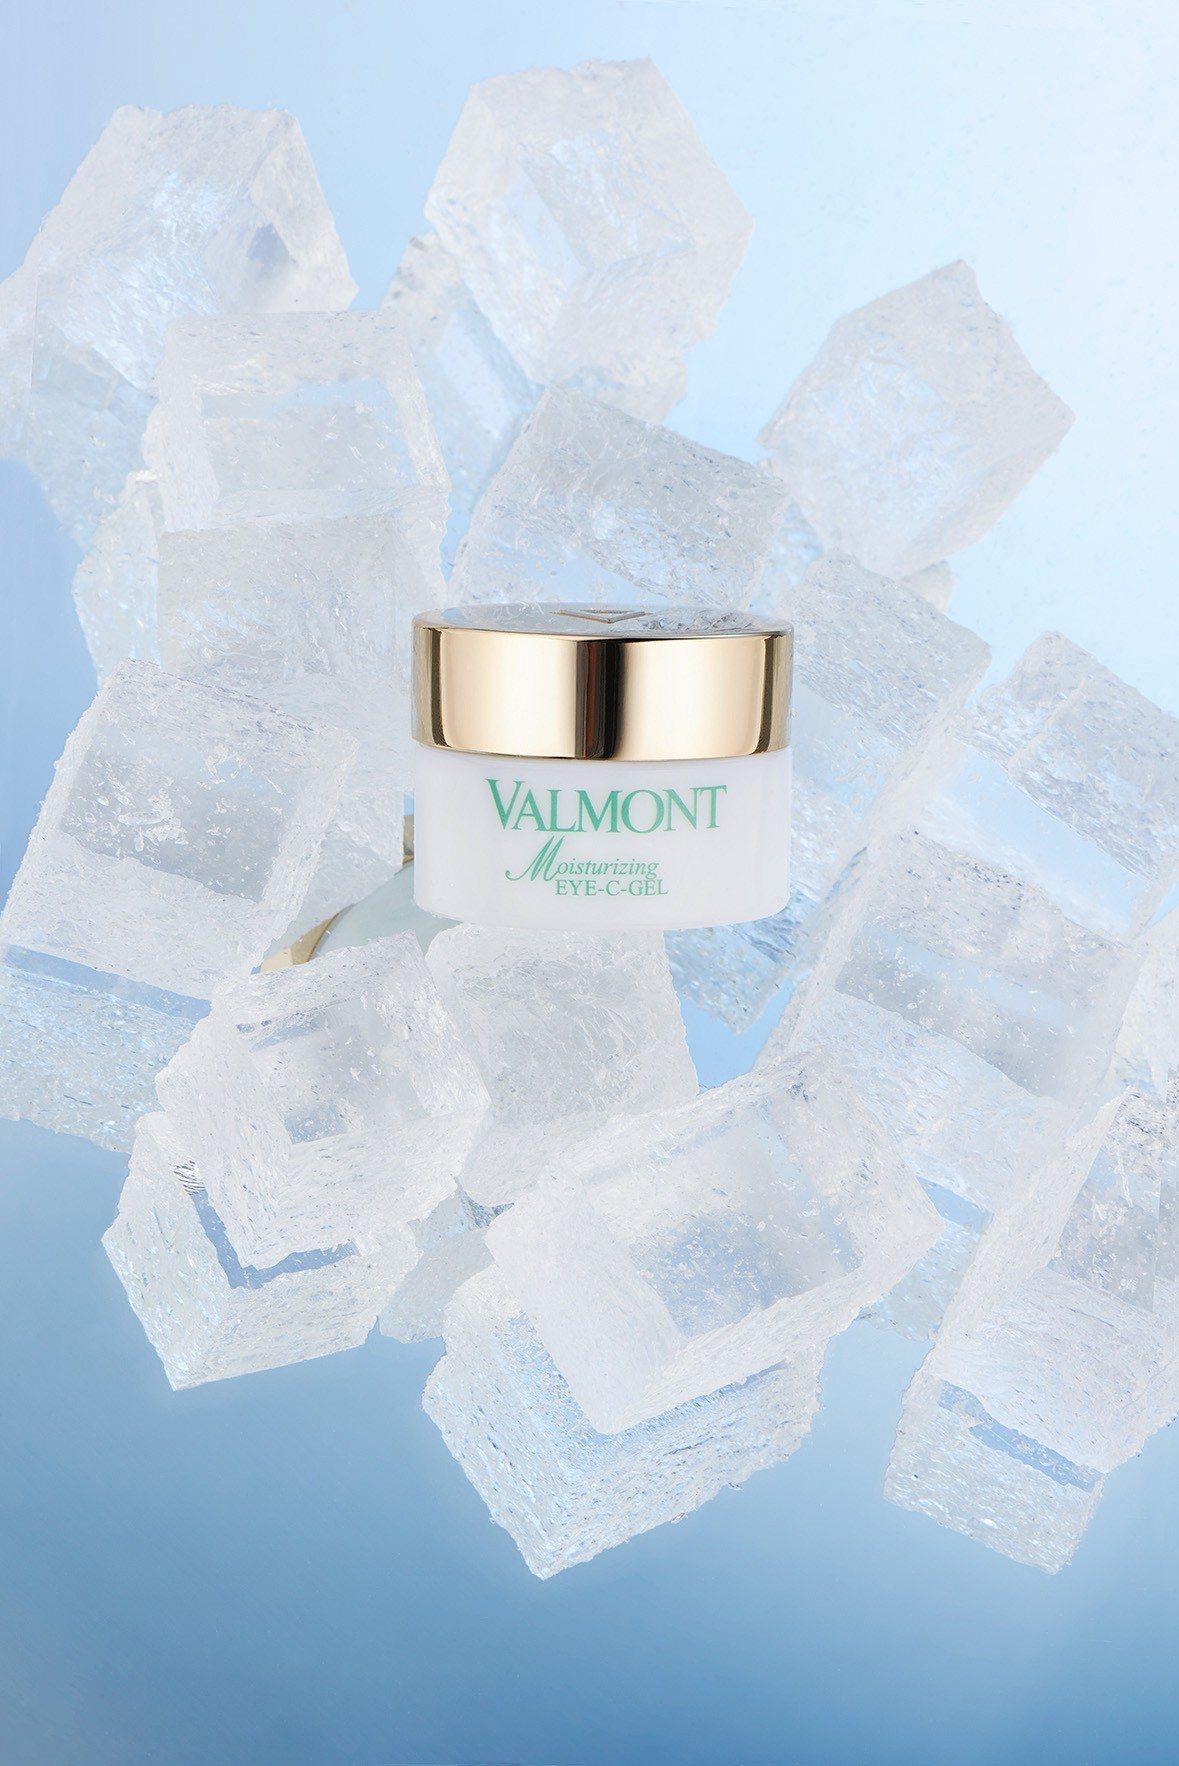 VALMONT極緻保濕亮眸眼膠,15ml售價3,800元。圖/VALMONT提供